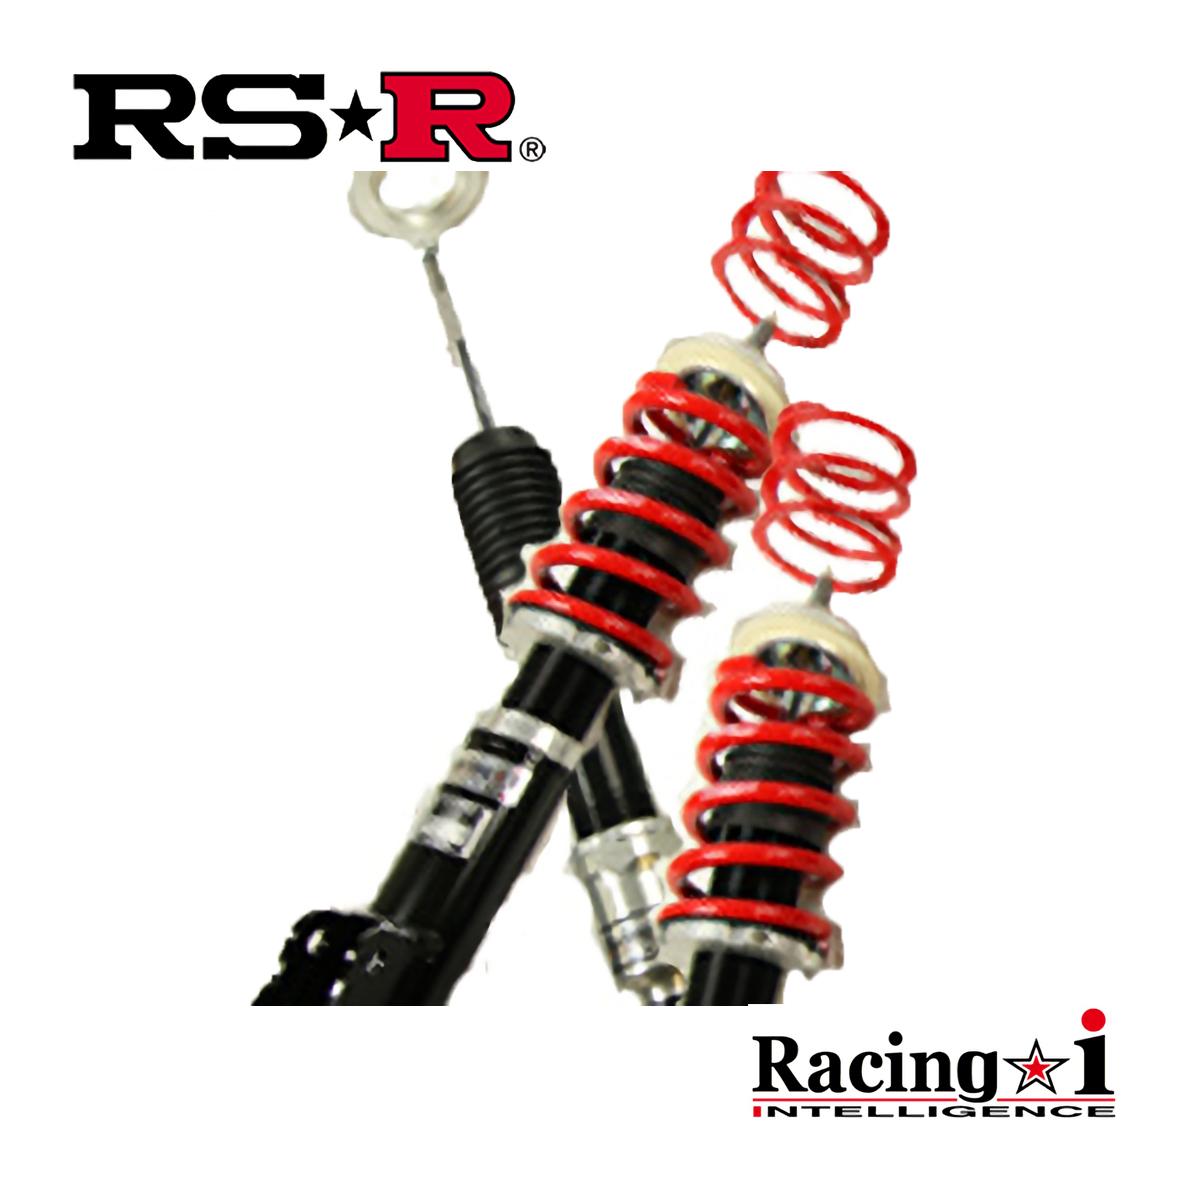 RS-R N-ONE RS JG1 車高調 リア車高調整:スペーサー式 SPIH450MSP レーシングi RSR 条件付き送料無料